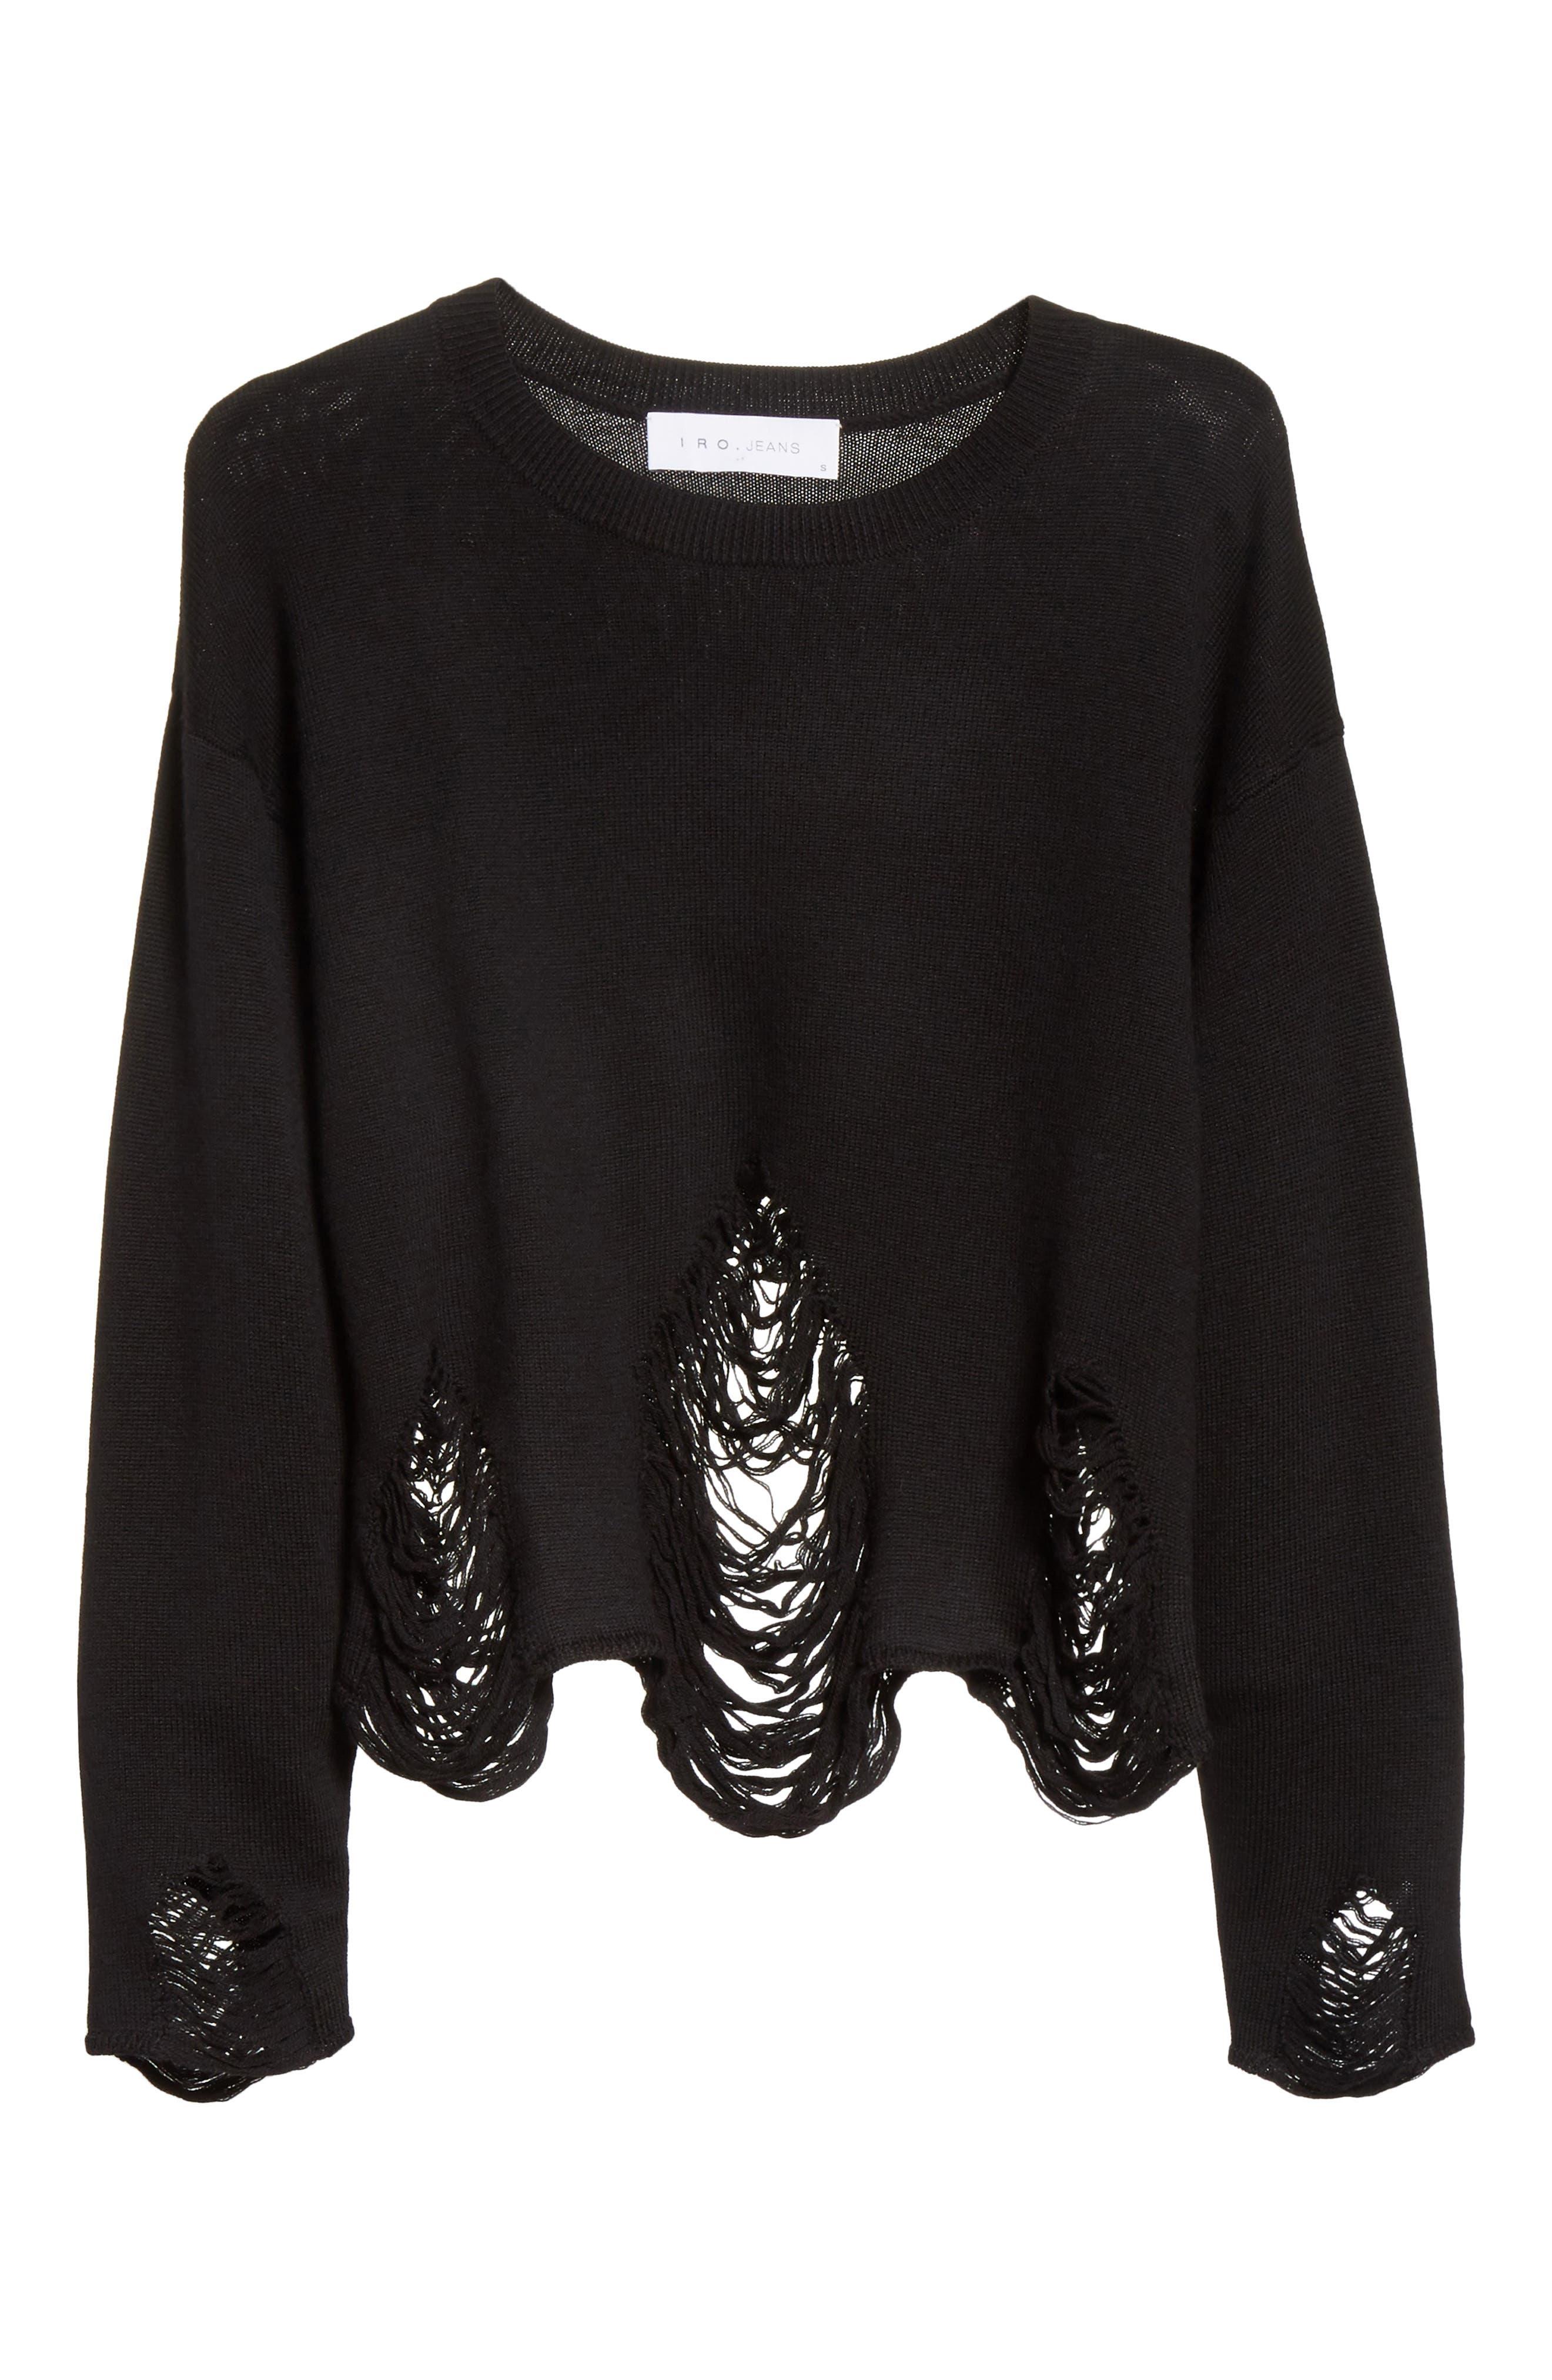 Parola Sweater,                             Alternate thumbnail 6, color,                             001